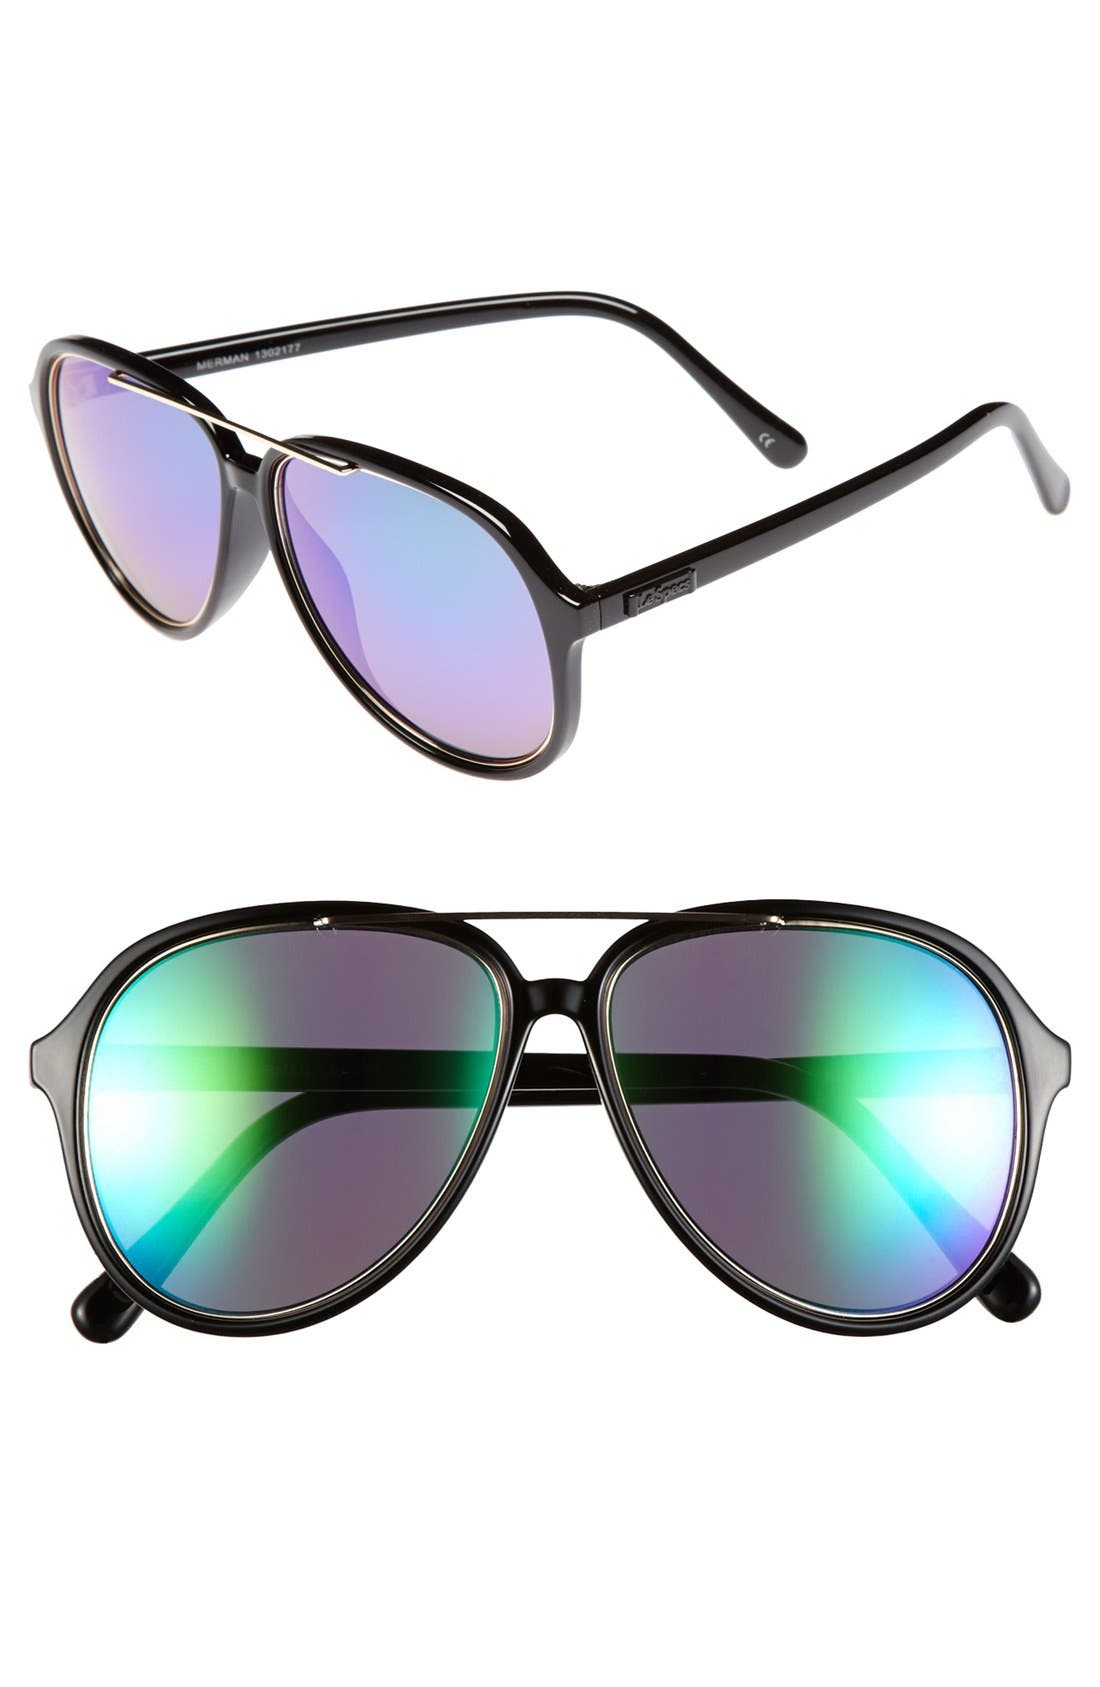 Alternate Image 1 Selected - Le Specs 'Merman' 58mm Aviator Sunglasses